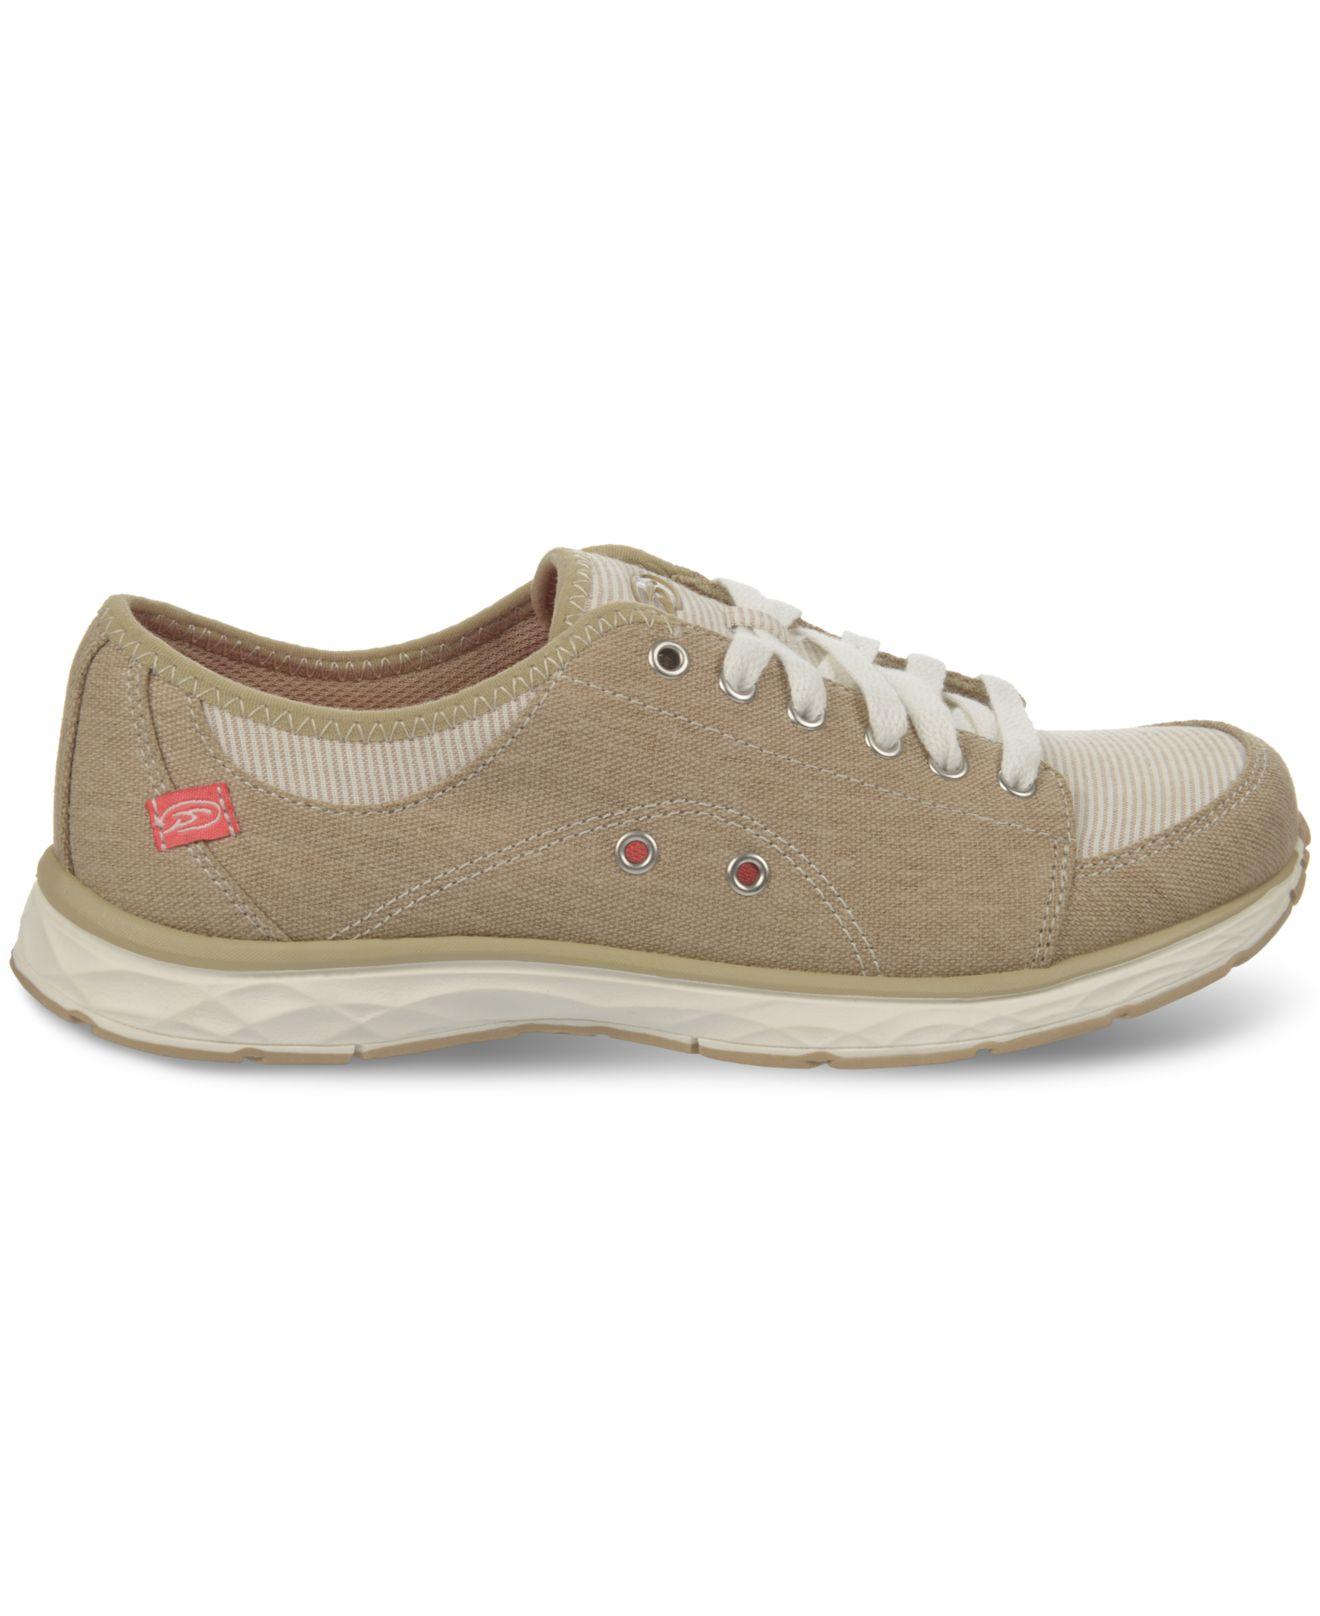 Dr Scholl S Orthotics Shoes